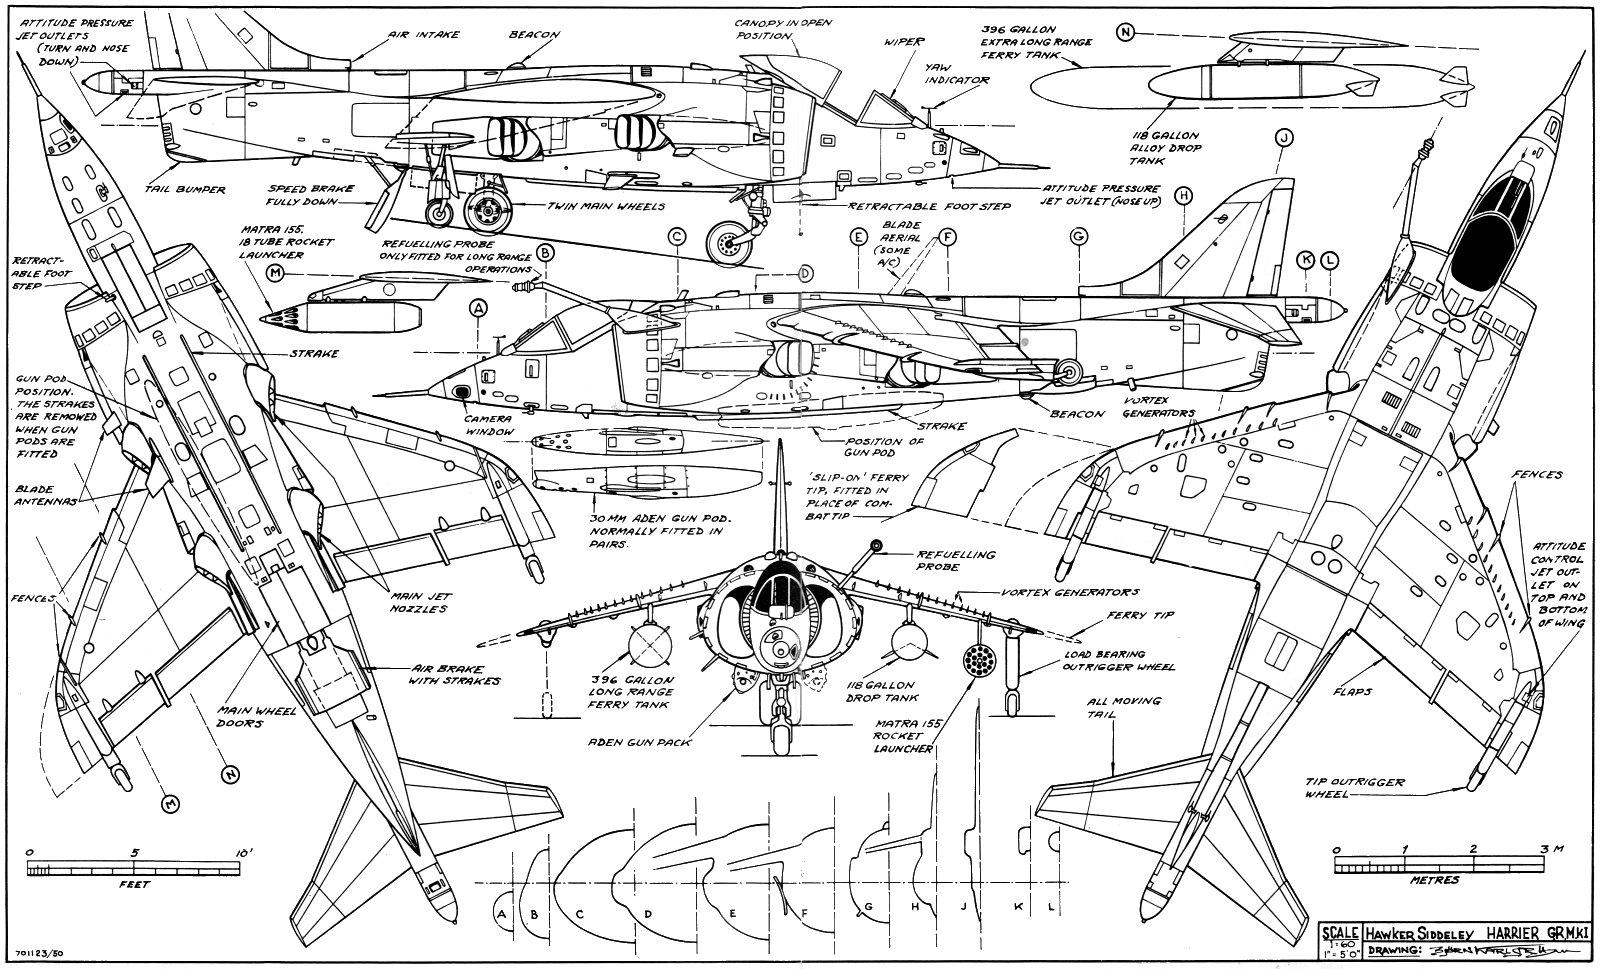 The Harrier Needs No Runway, June 1971 American Aircraft